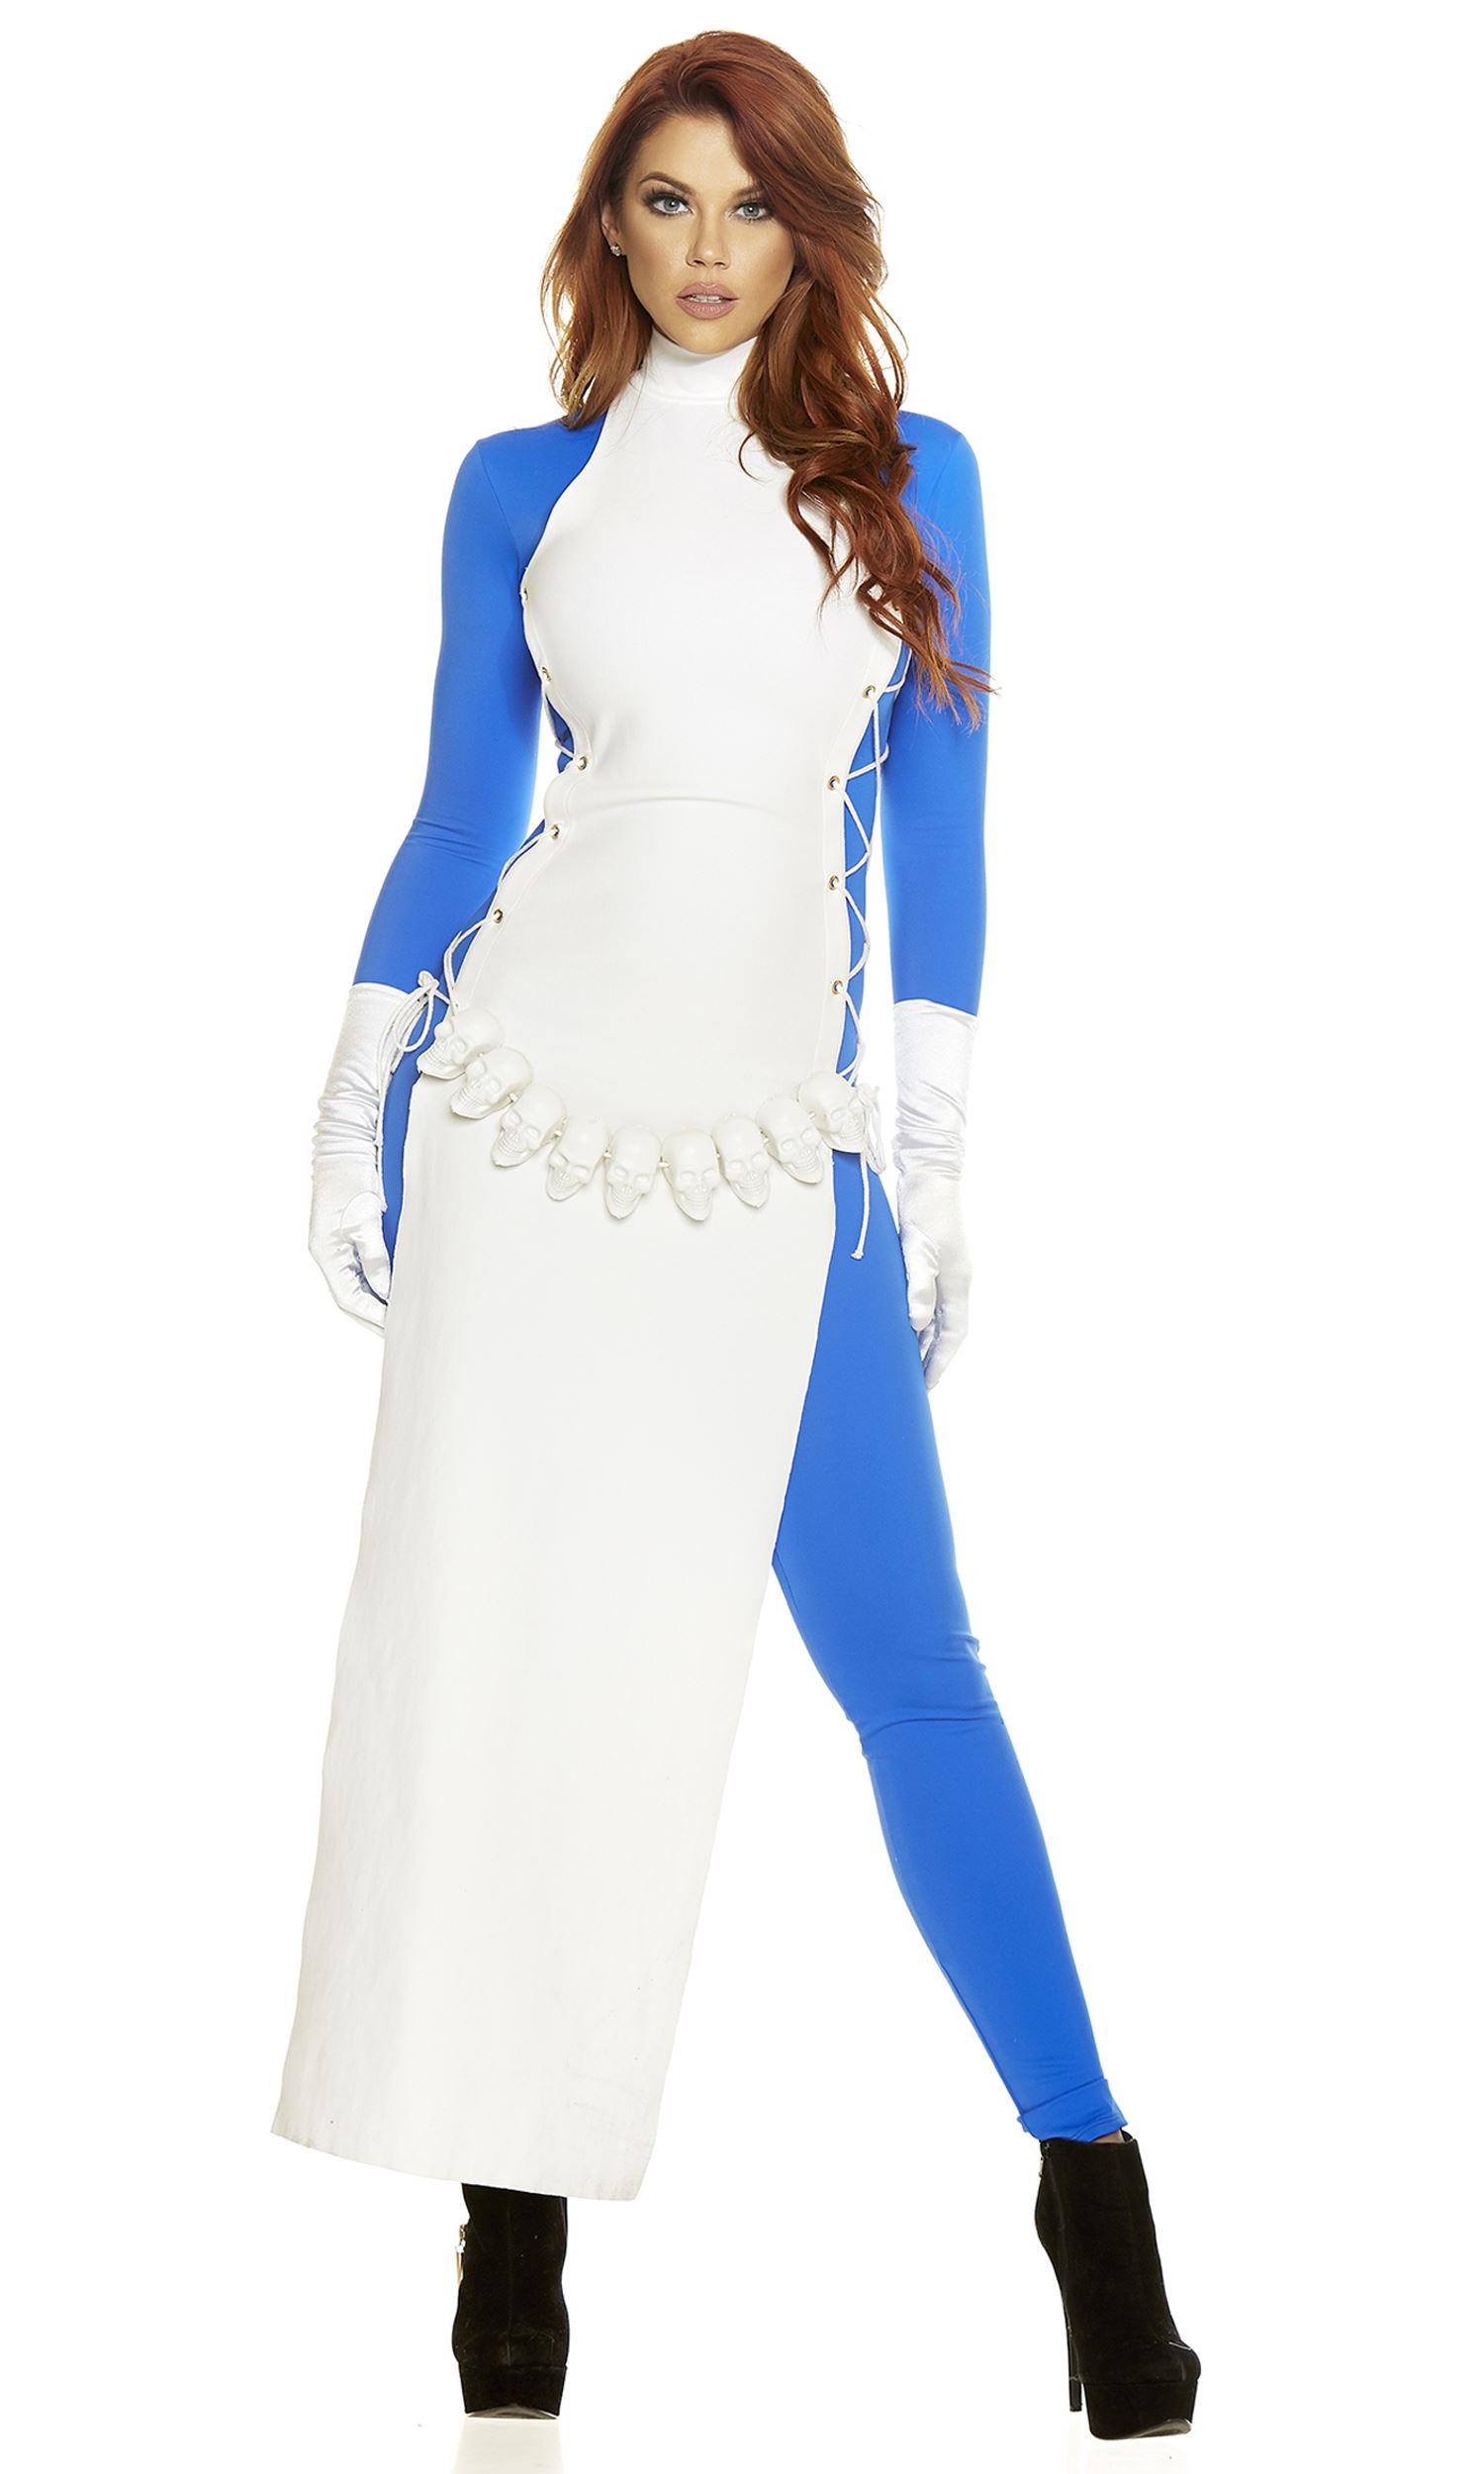 Adult Comic Book Villain Woman Costume